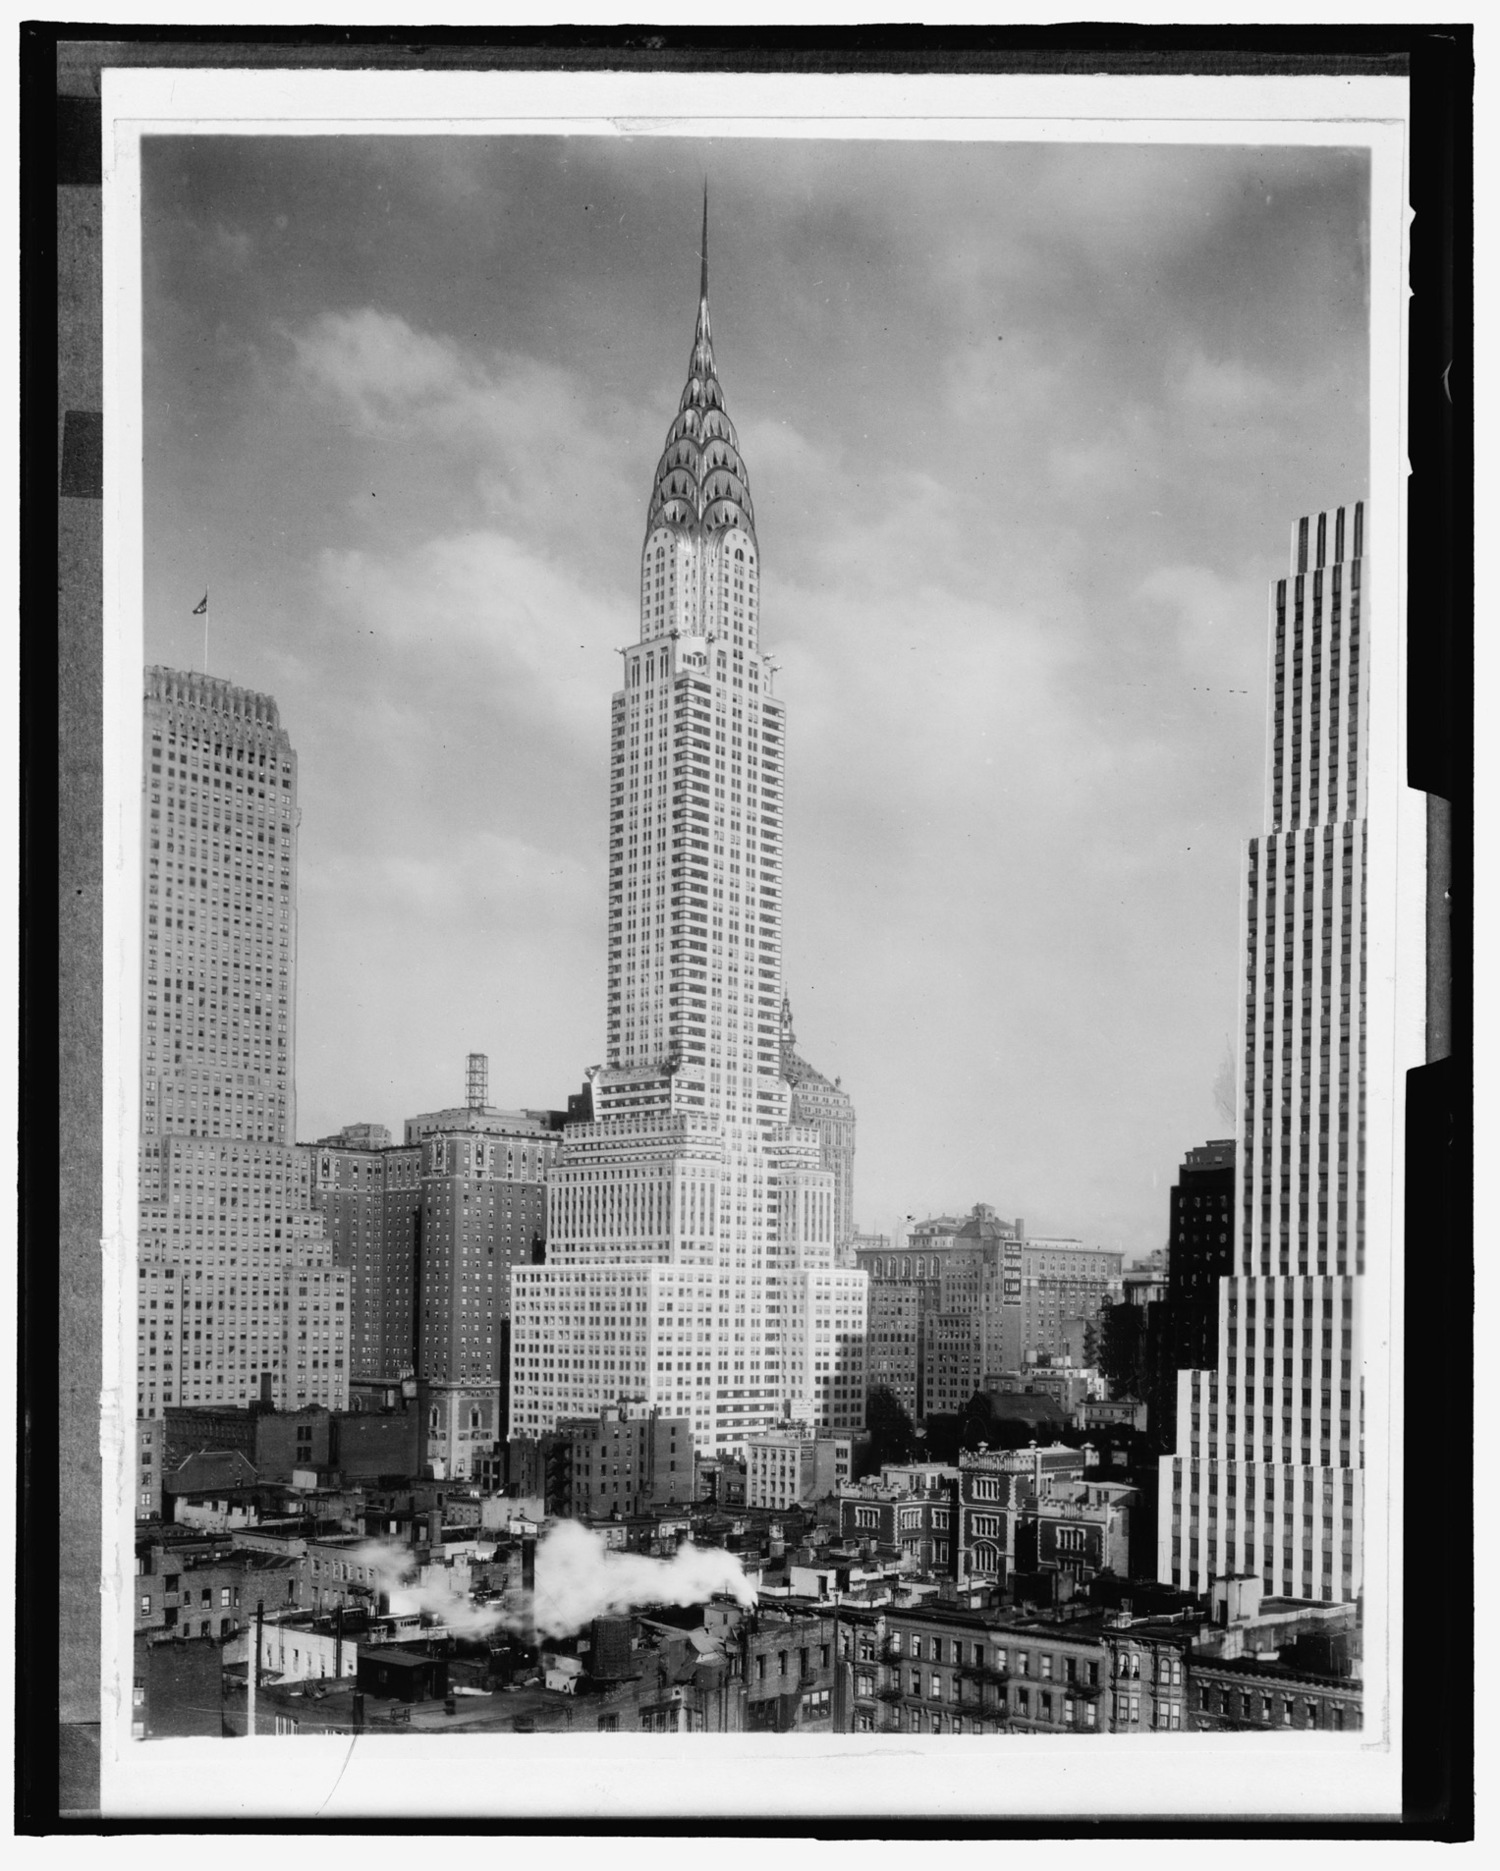 Chrysler Building, New York, N.Y., 1930